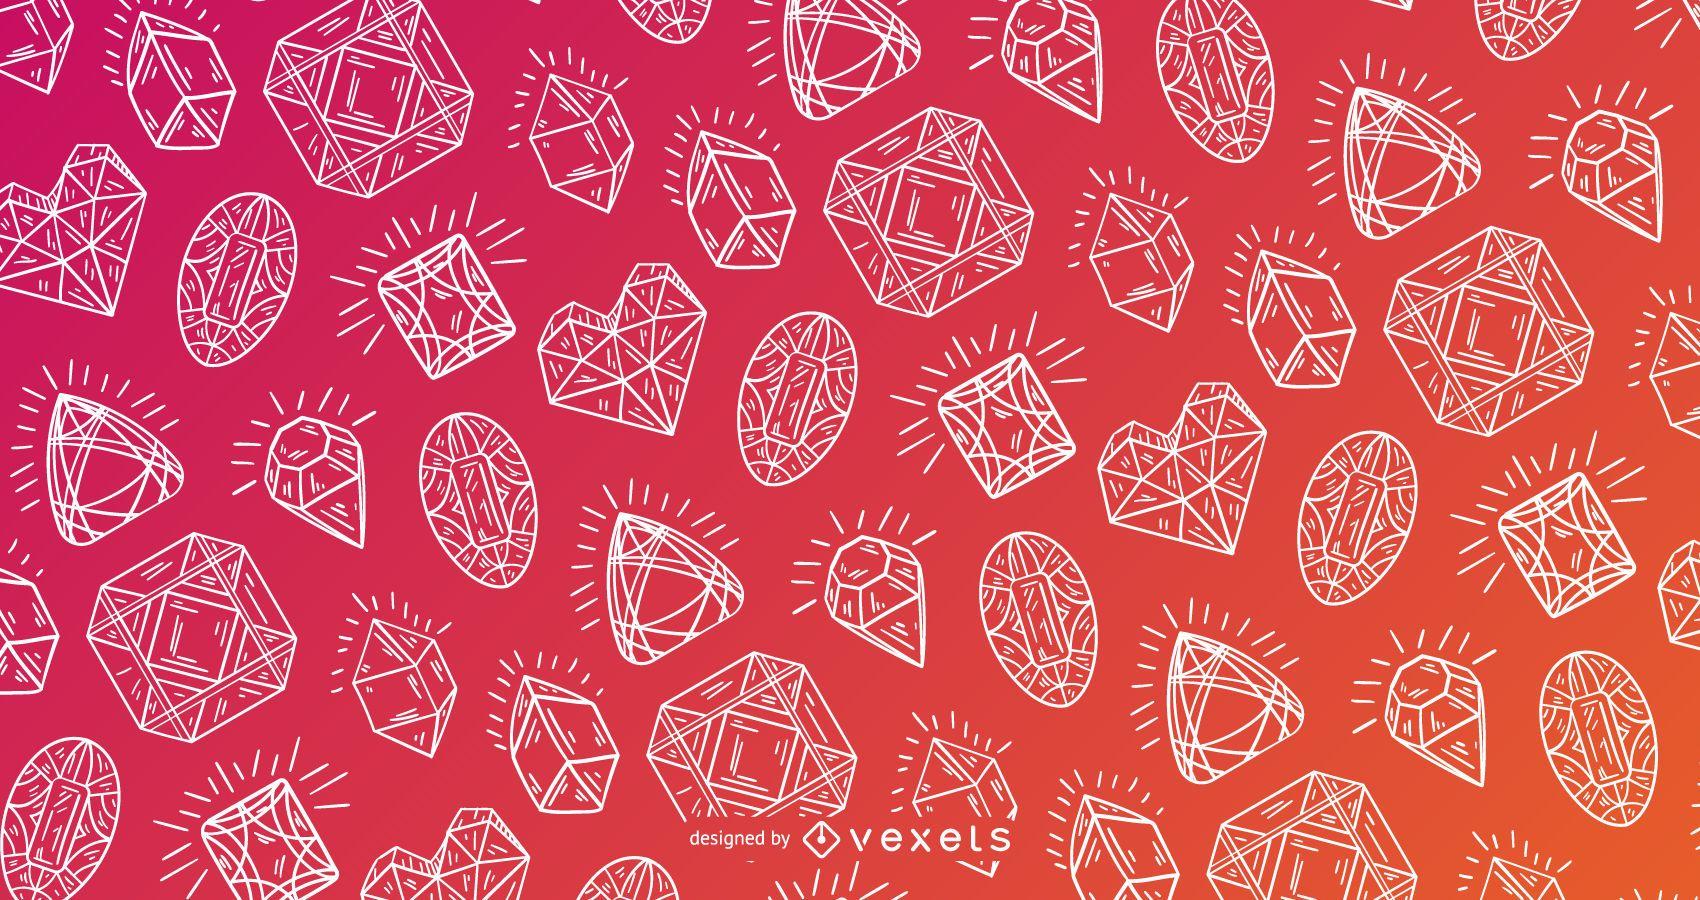 Crystal pattern detailed design